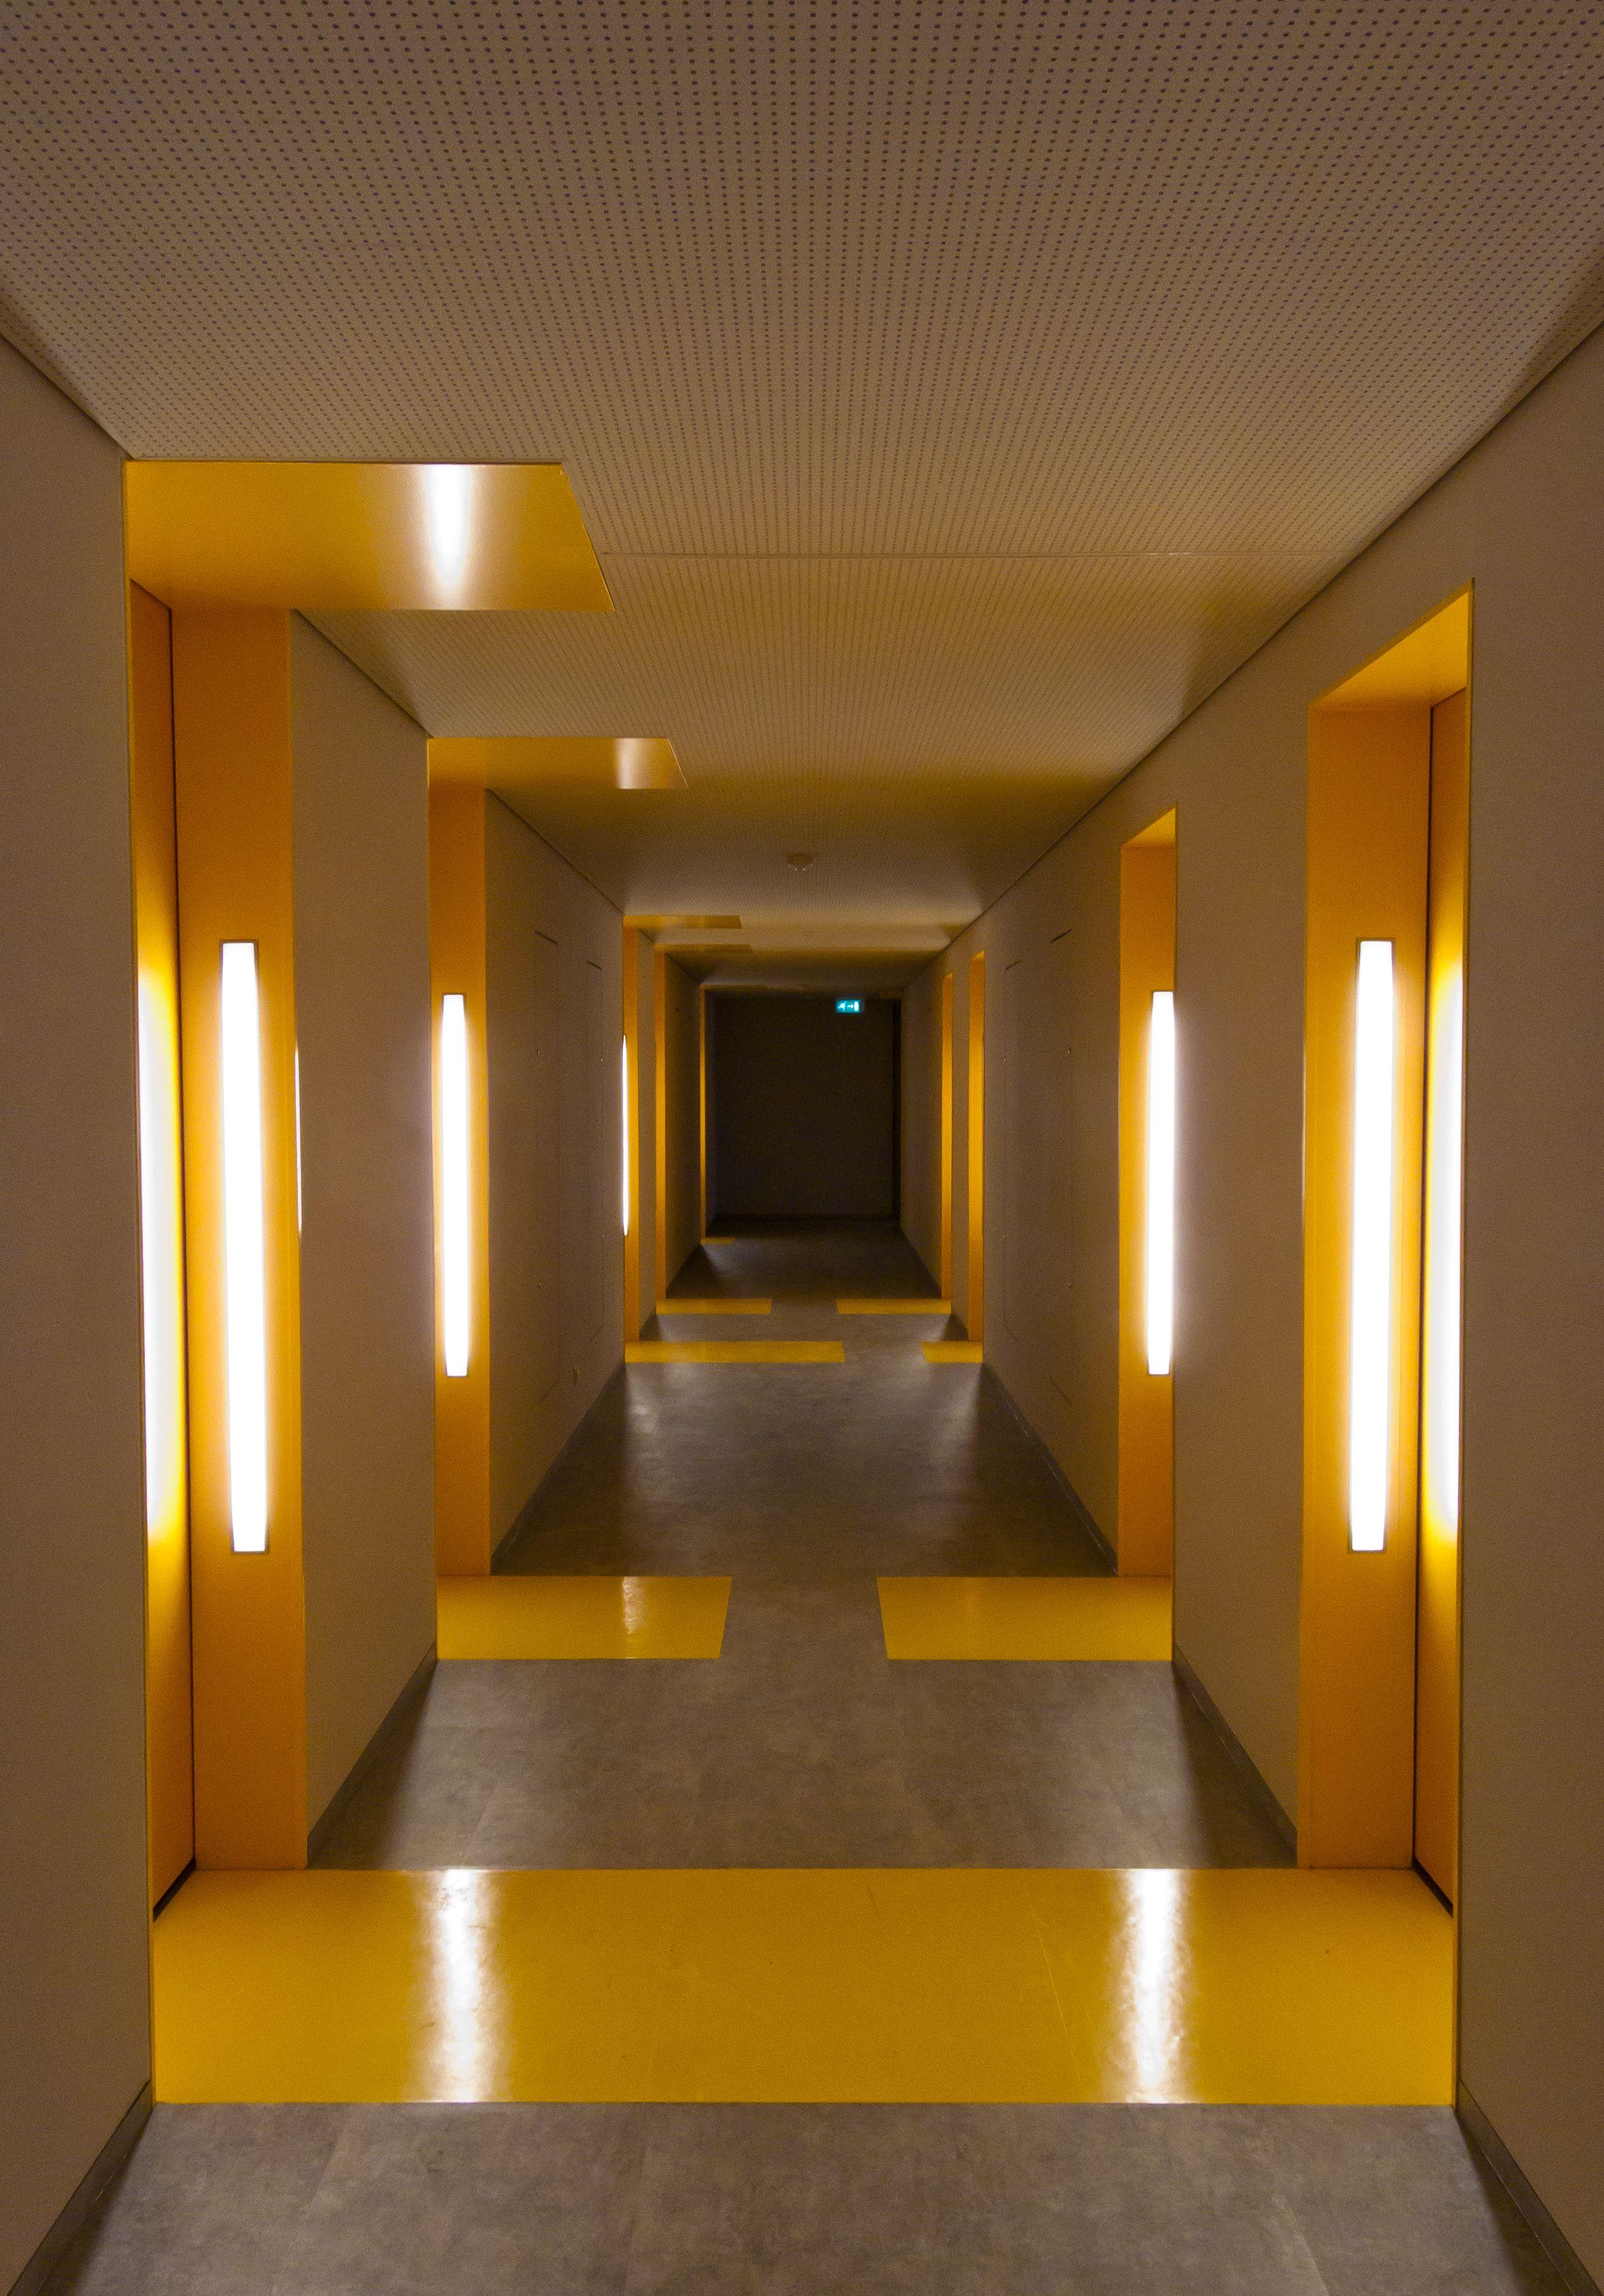 Duwo Student Housing Hallway At Uilenstede Amstelveen